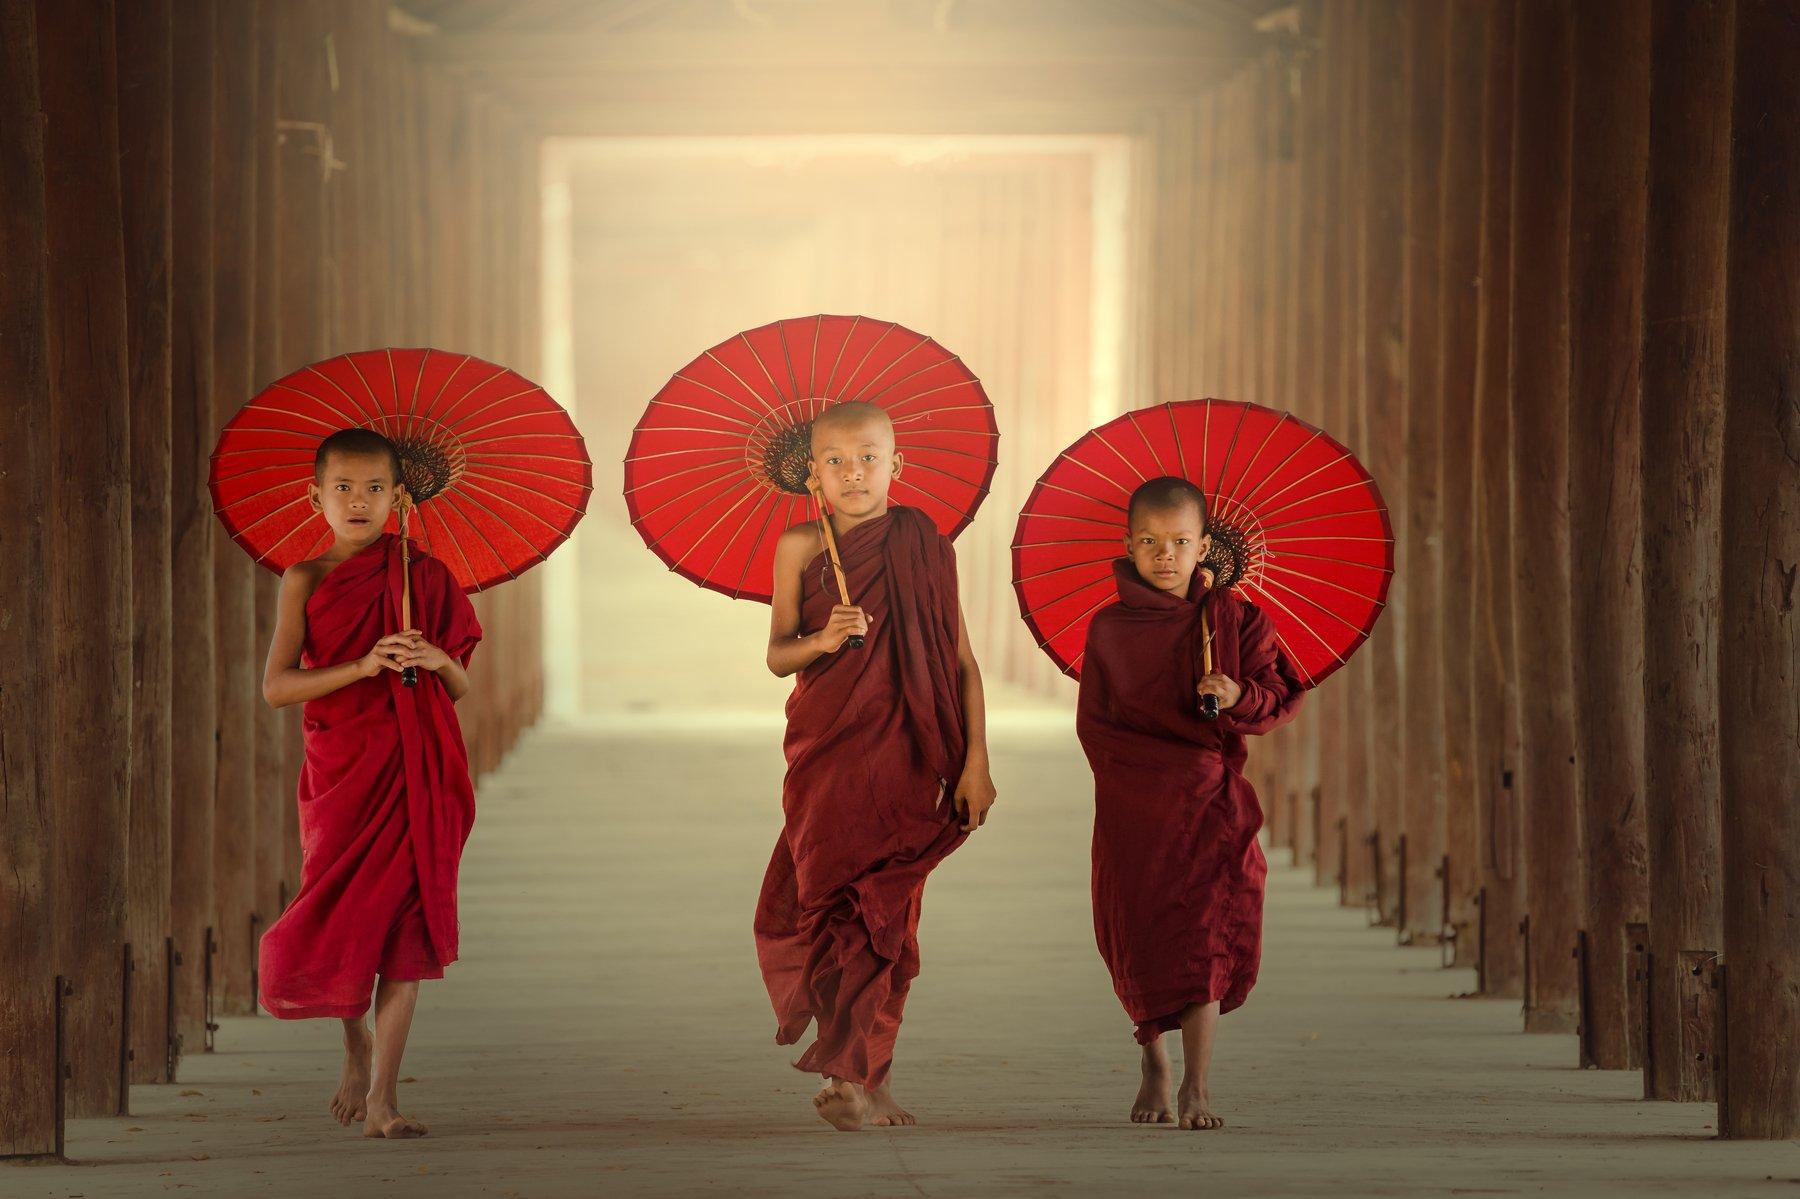 buddha,buddhism,buddhist,boys,portrait,, SUTIPORN SOMNAM